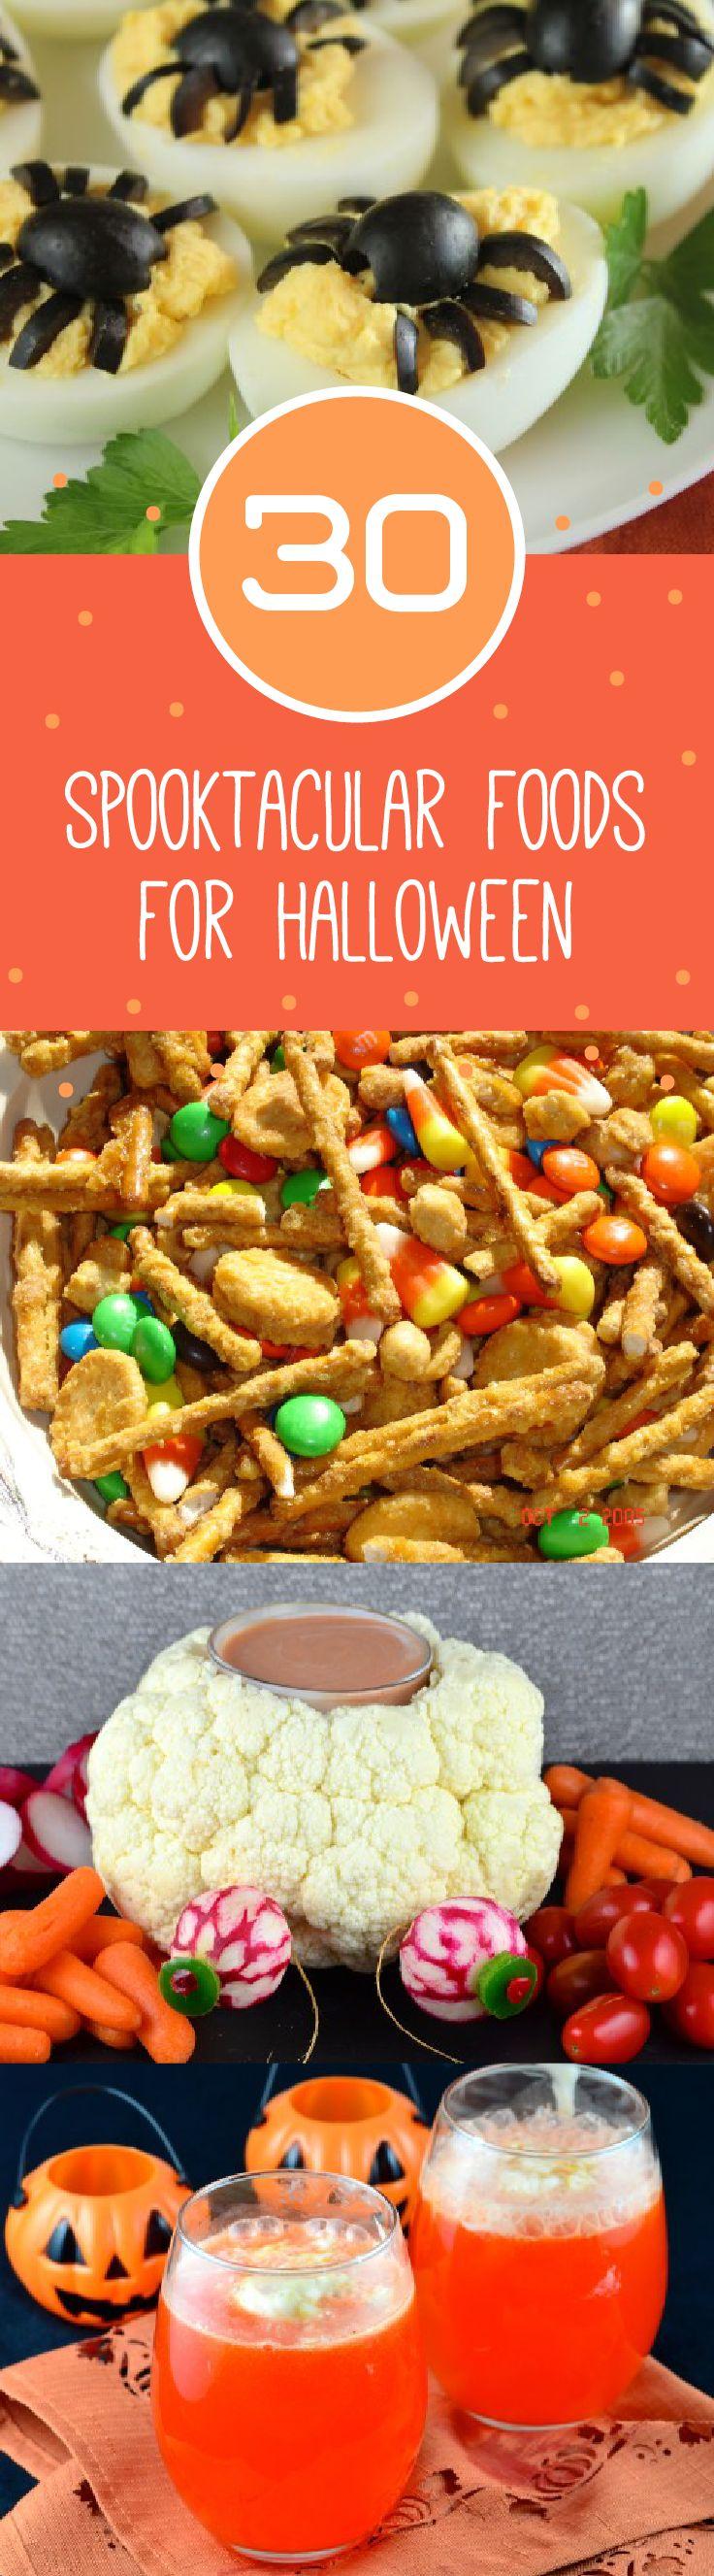 207 best Halloween images on Pinterest